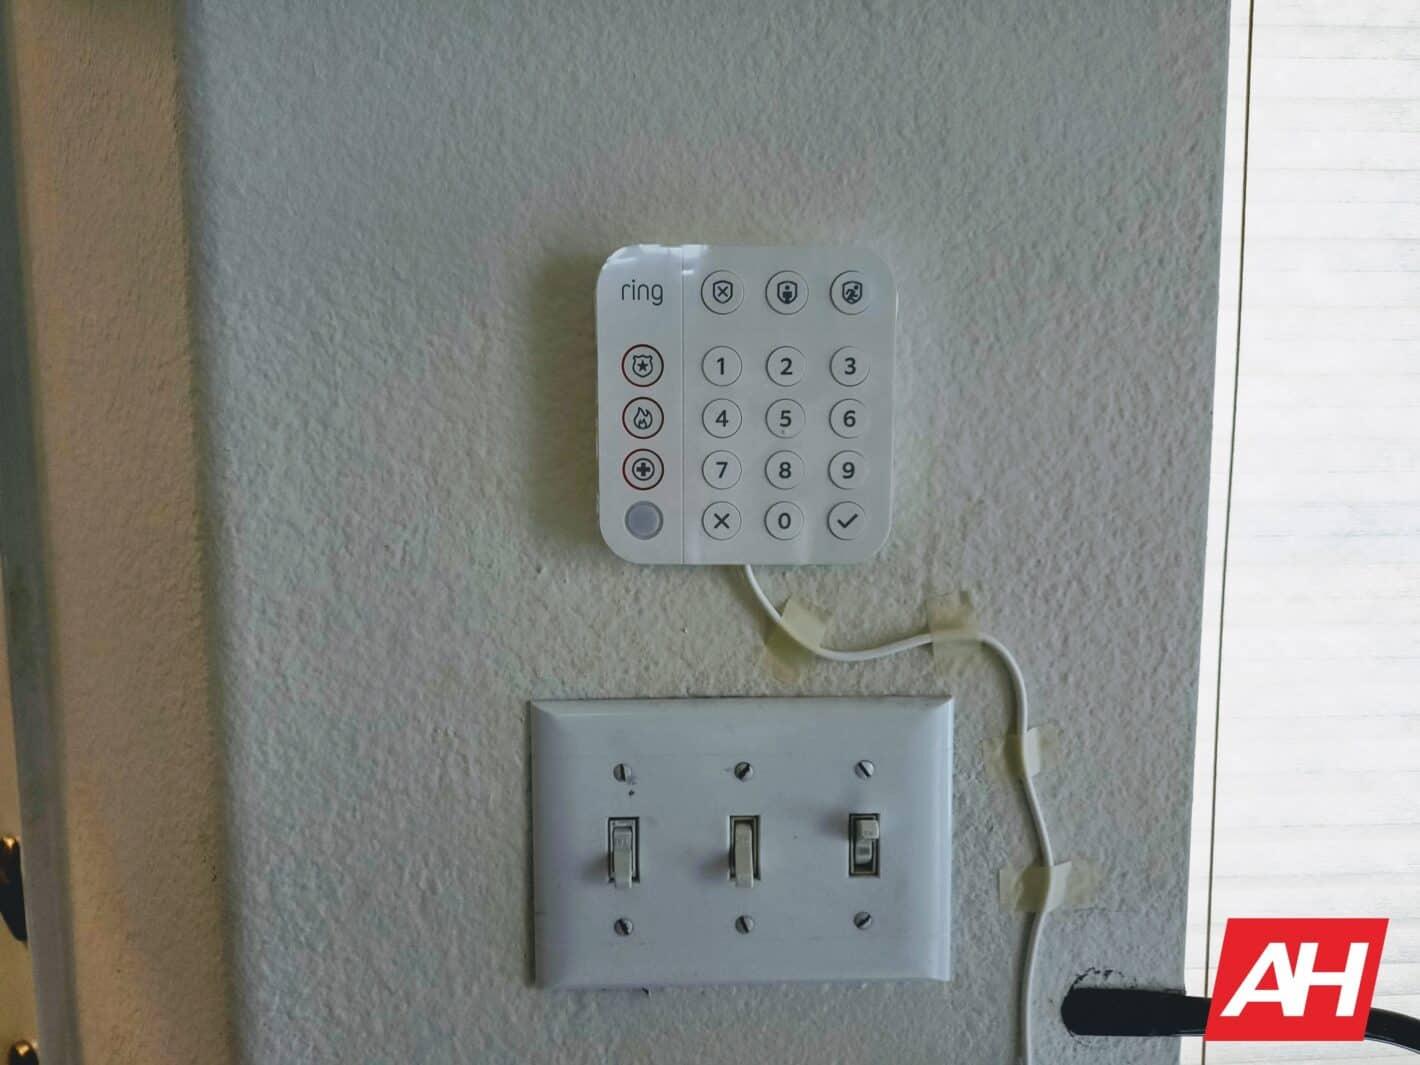 Ring Alarm AH HR Keypad